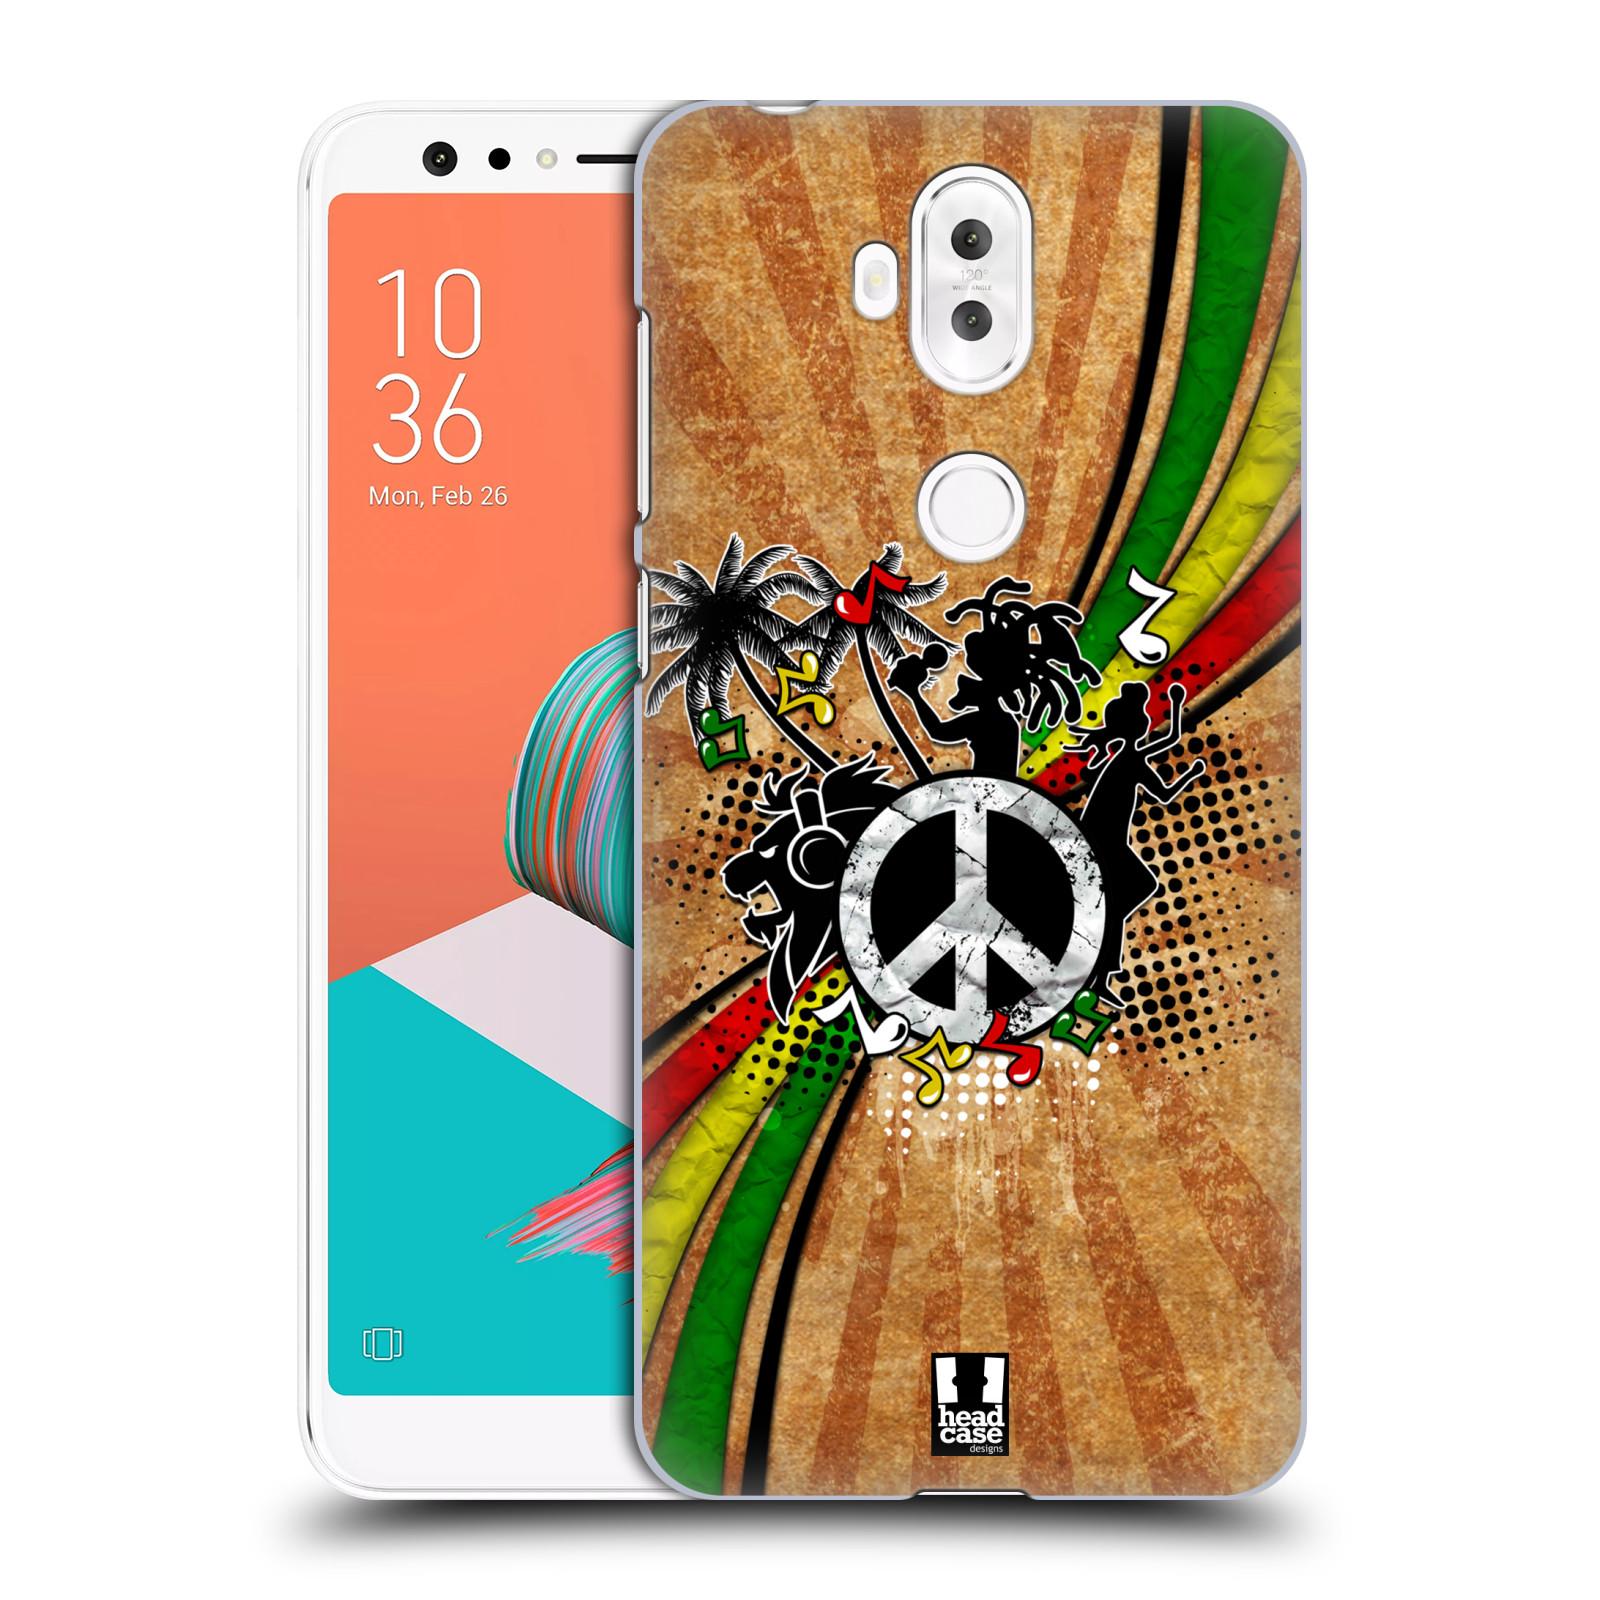 Plastové pouzdro na mobil Asus ZenFone 5 Lite ZC600KL - Head Case - REGGAE (Plastový kryt či obal na mobilní telefon Asus ZenFone 5 Lite (ZC600KL) s motivem REGGAE)